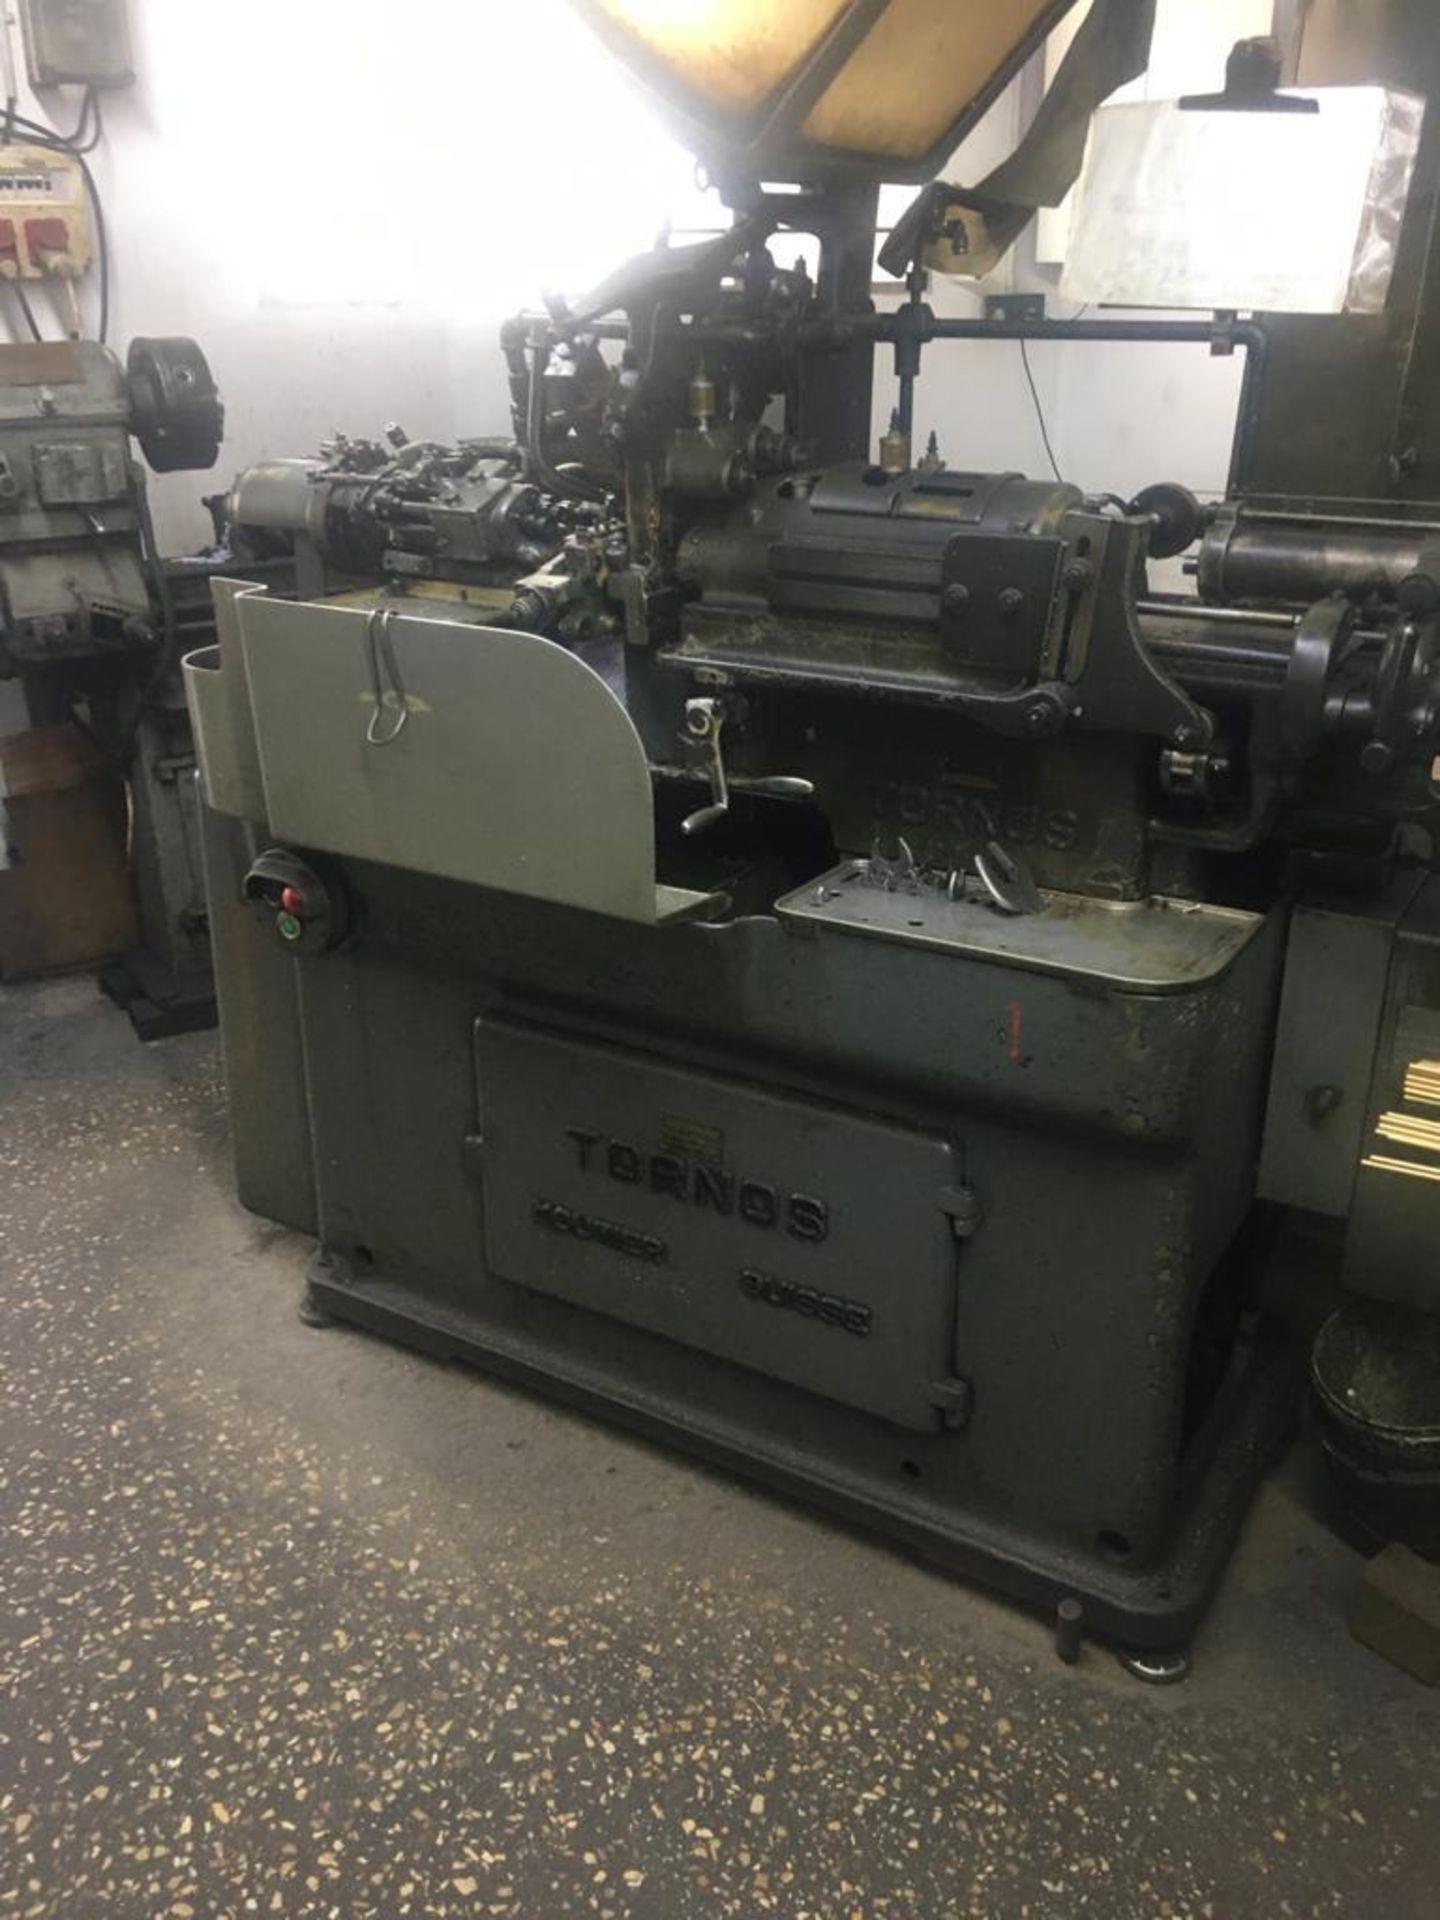 Lot 65 - TORNOS SAUTER SWISS TYPE SCREW MACHINE; MODEL RR20